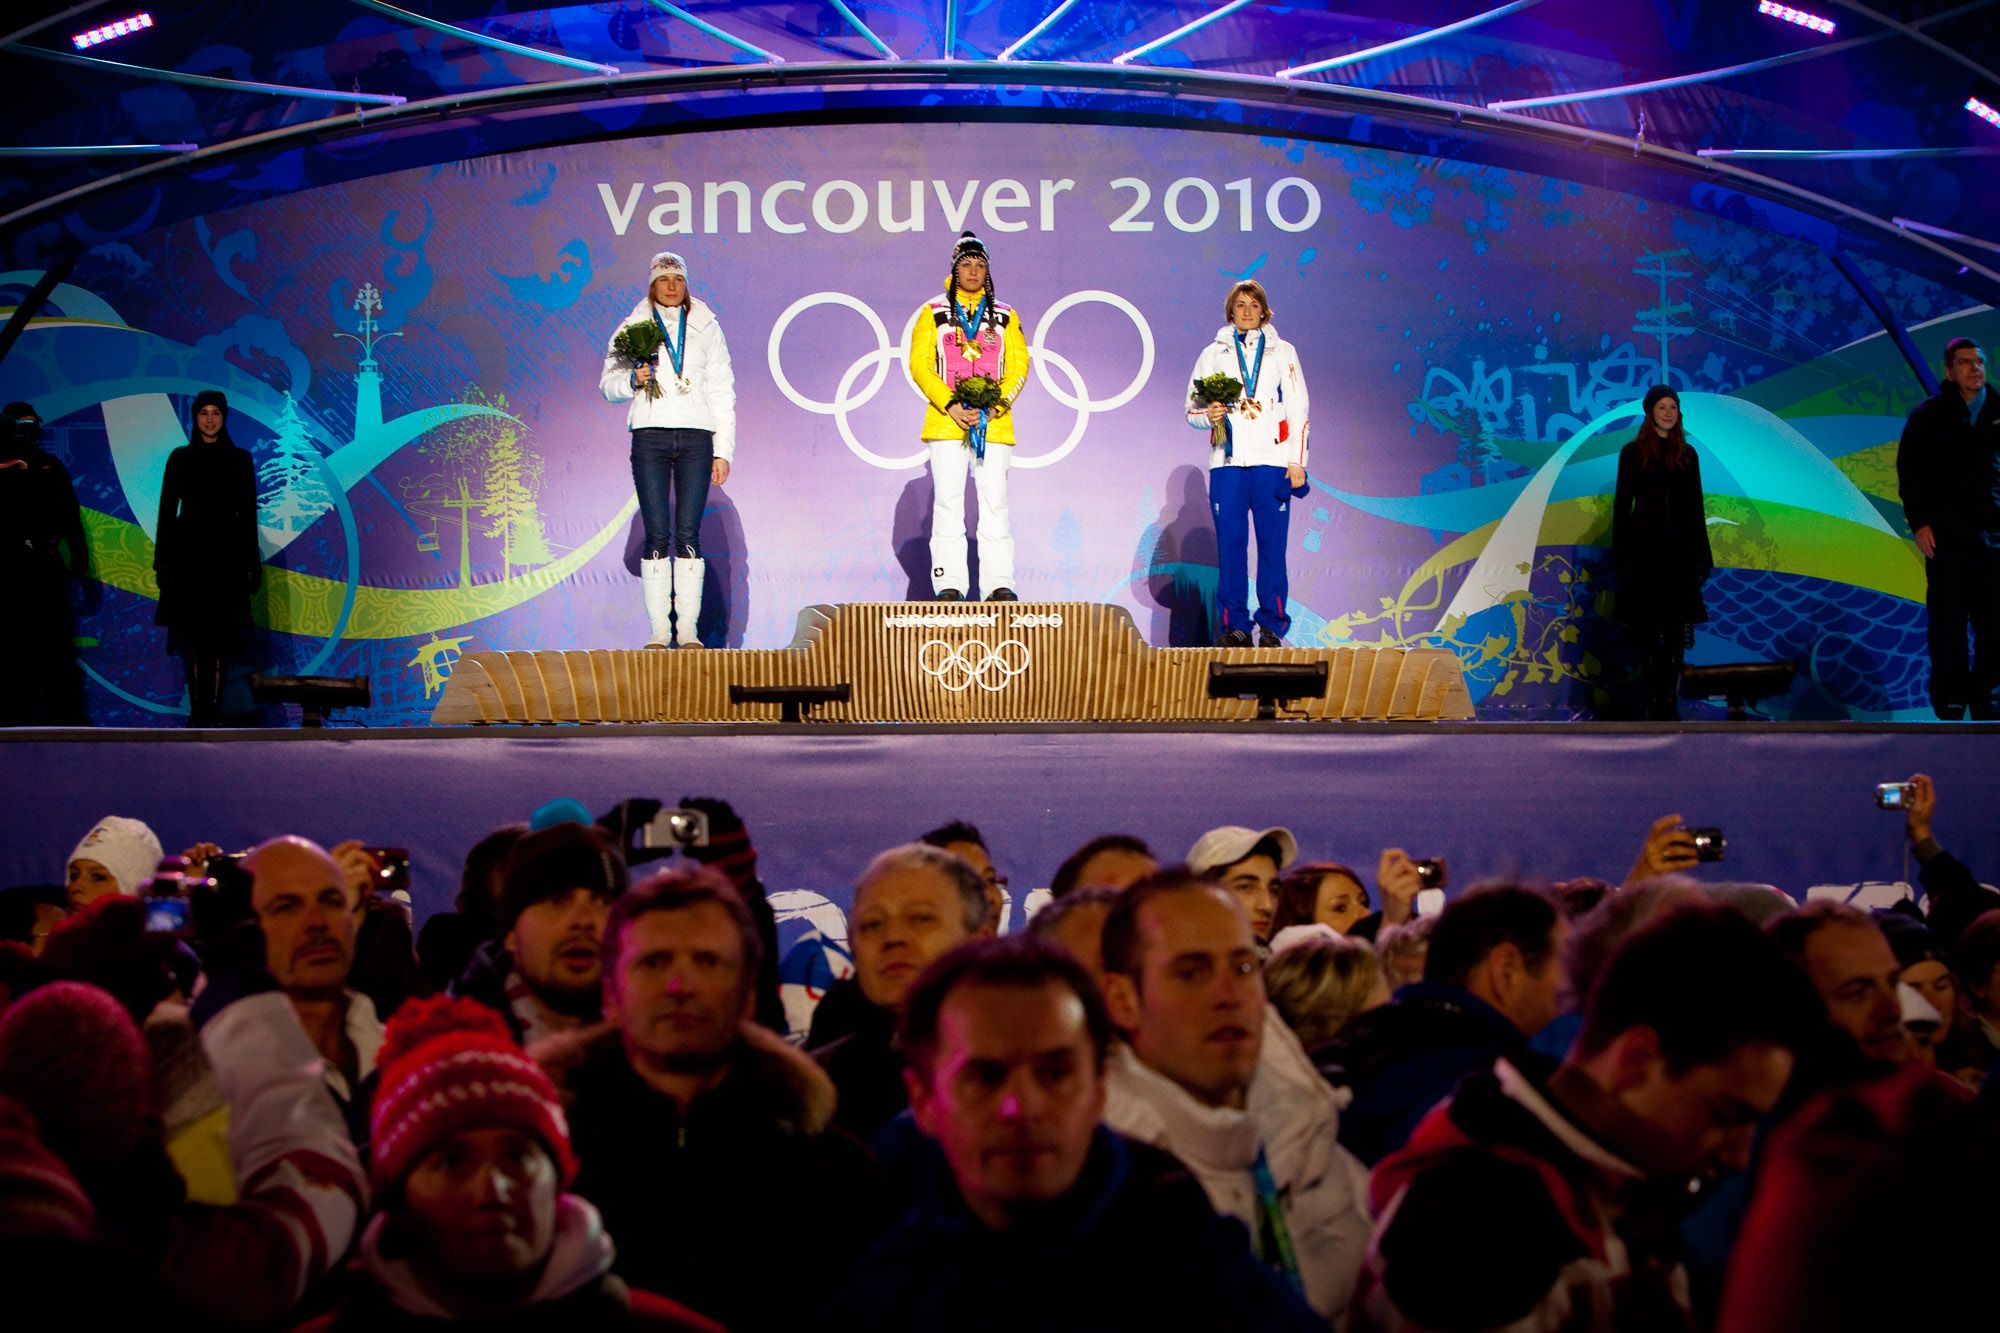 Justa-Jeskova-sport-events-photography-JJ006674.jpg